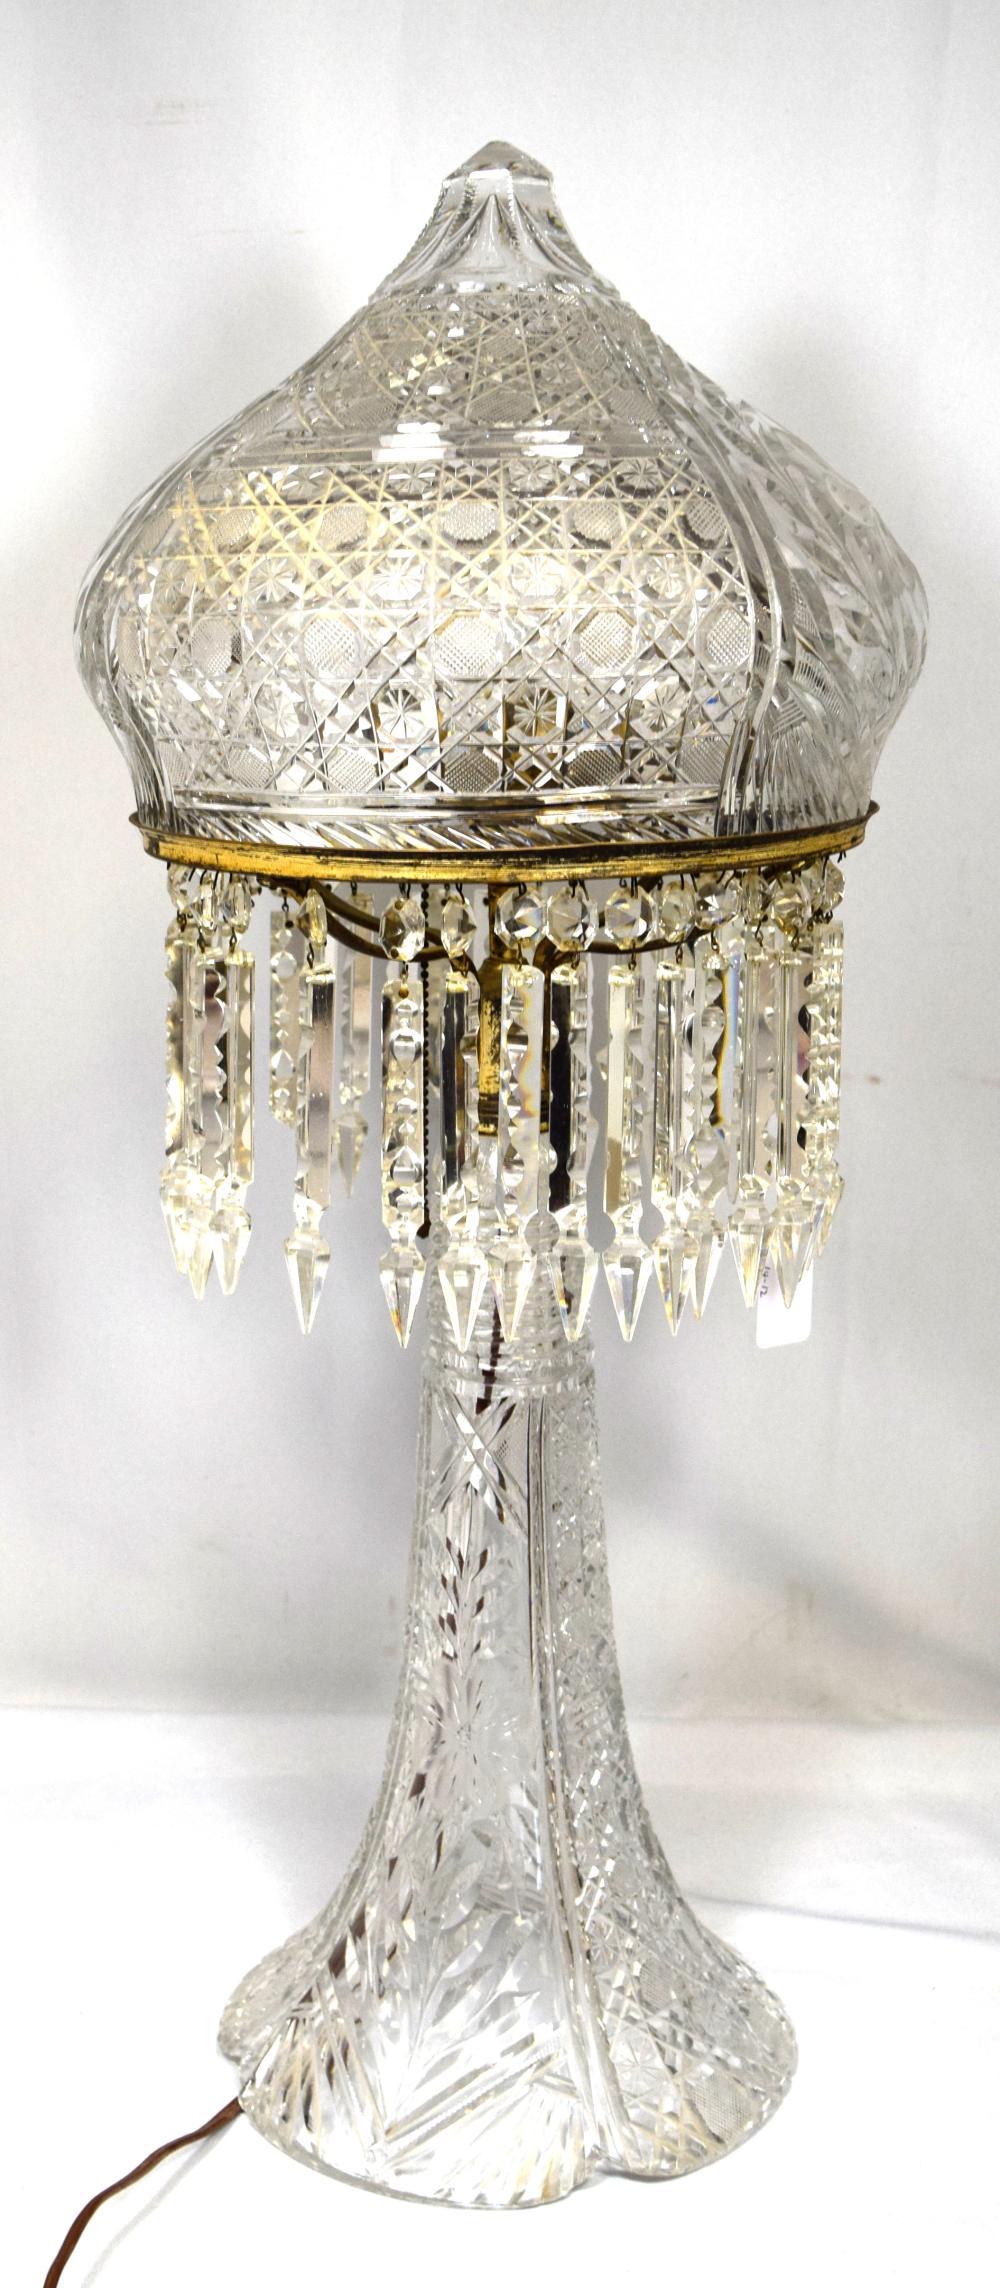 MILLER AMERICAN BRILLIANT CUT GLASS LAMP: